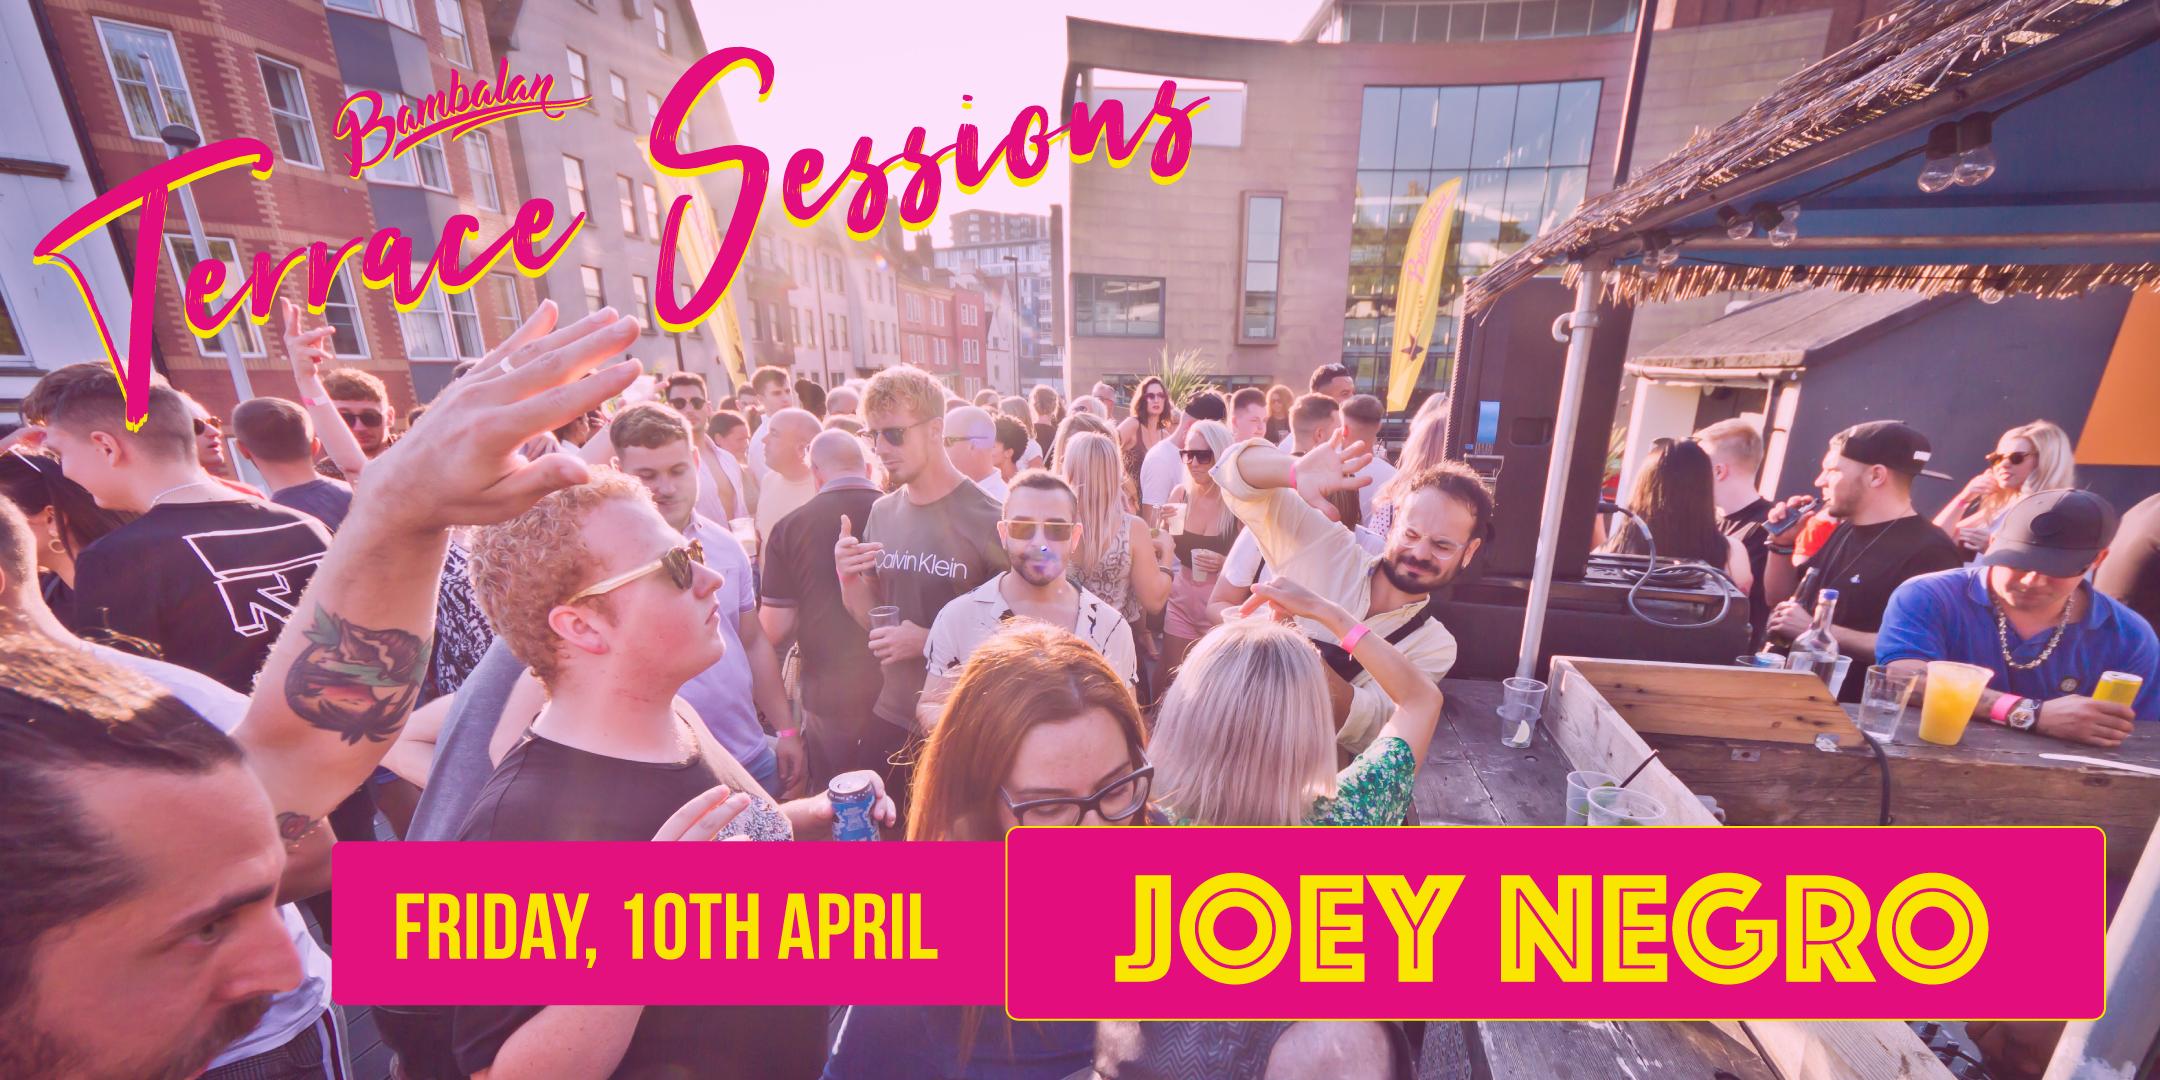 Bambalan Terrace Sessions presents...Joey Negro